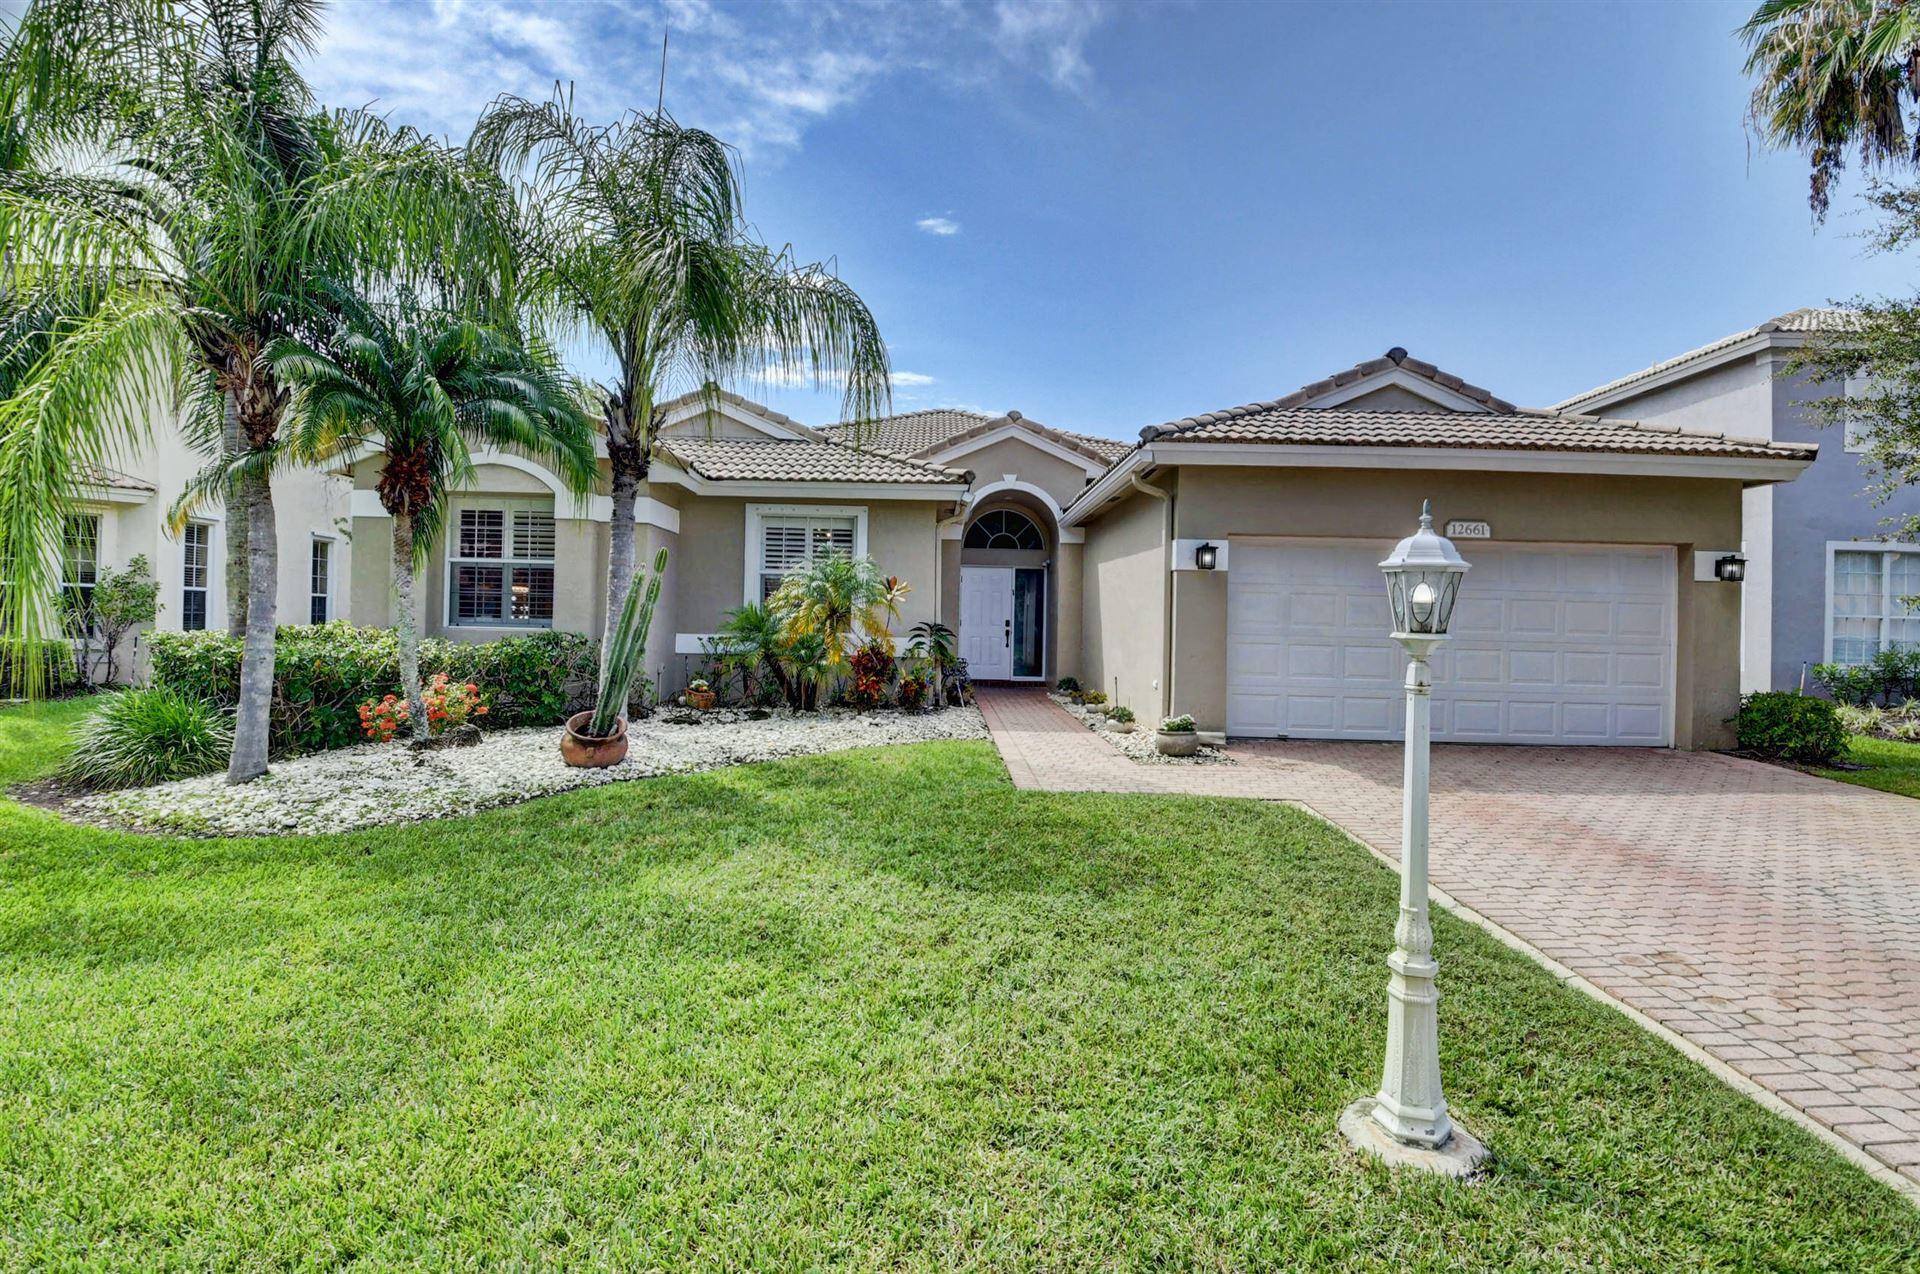 12661 Yardley Drive, Boca Raton, FL 33428 - MLS#: RX-10734390